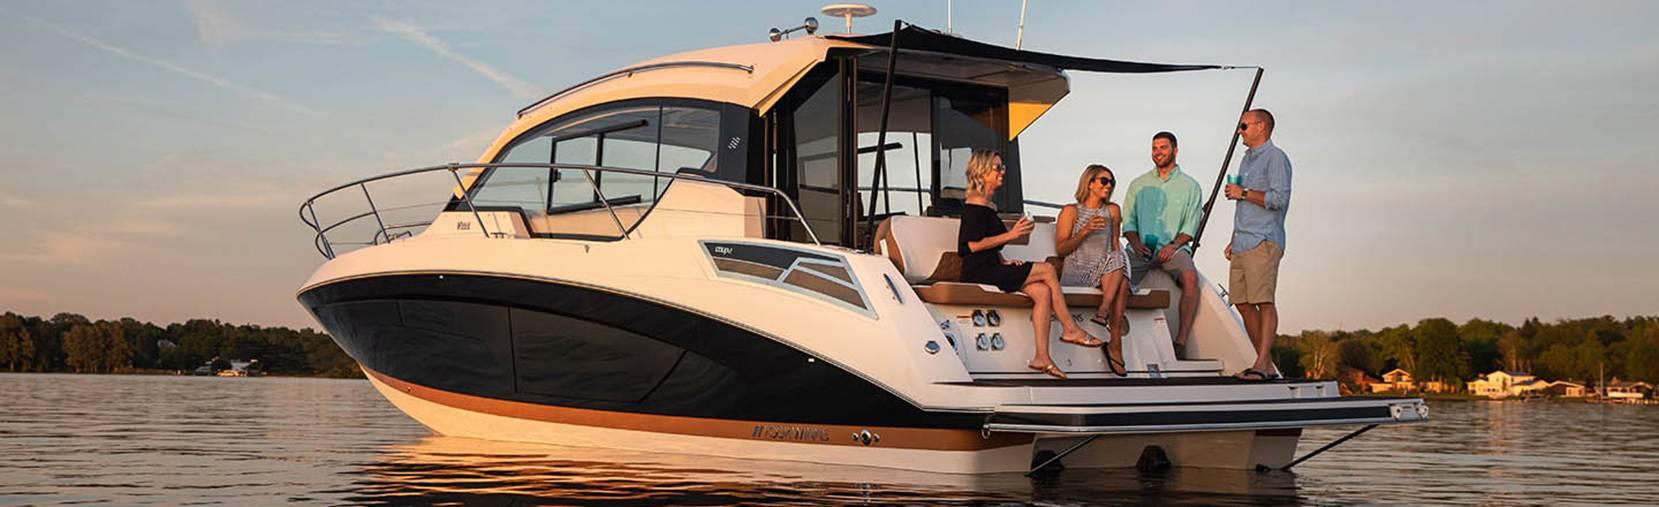 Four Winns Vista 355 Coupe boat